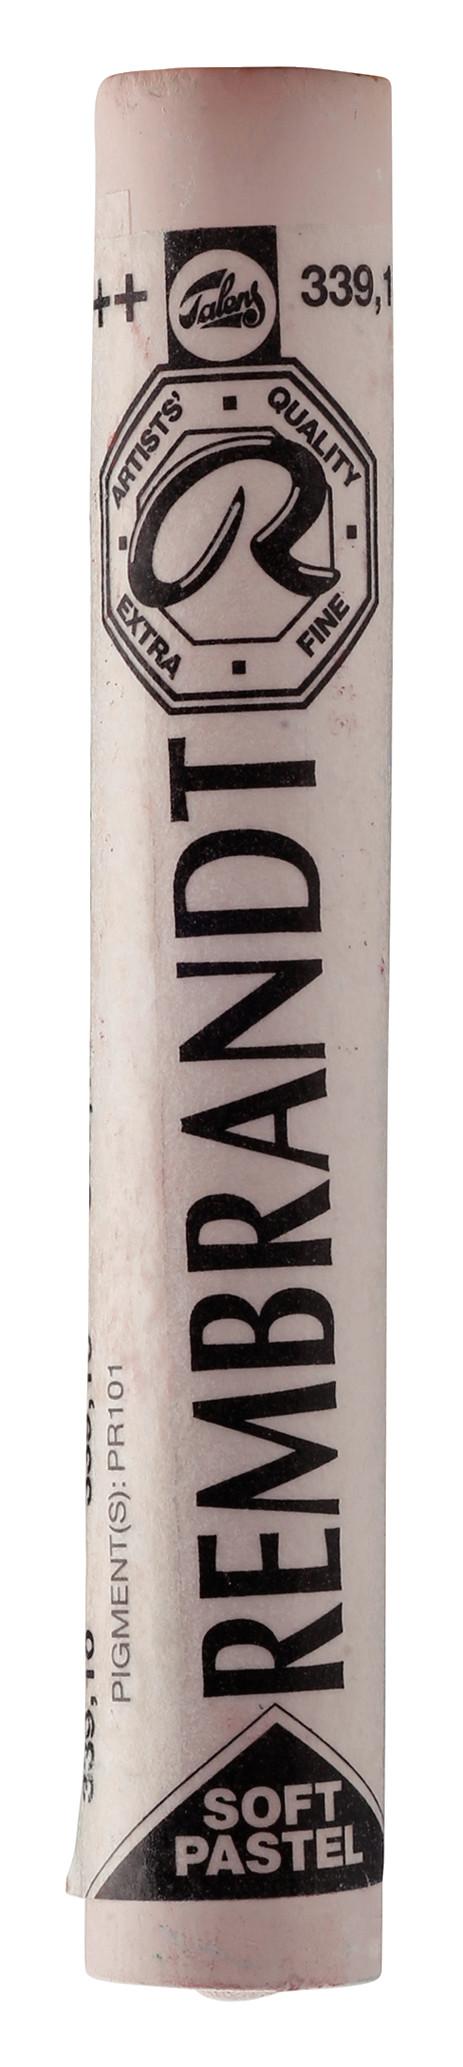 Rembrandt Soft Pastel Round Full Stick Light Oxide Red(10) (339.1)